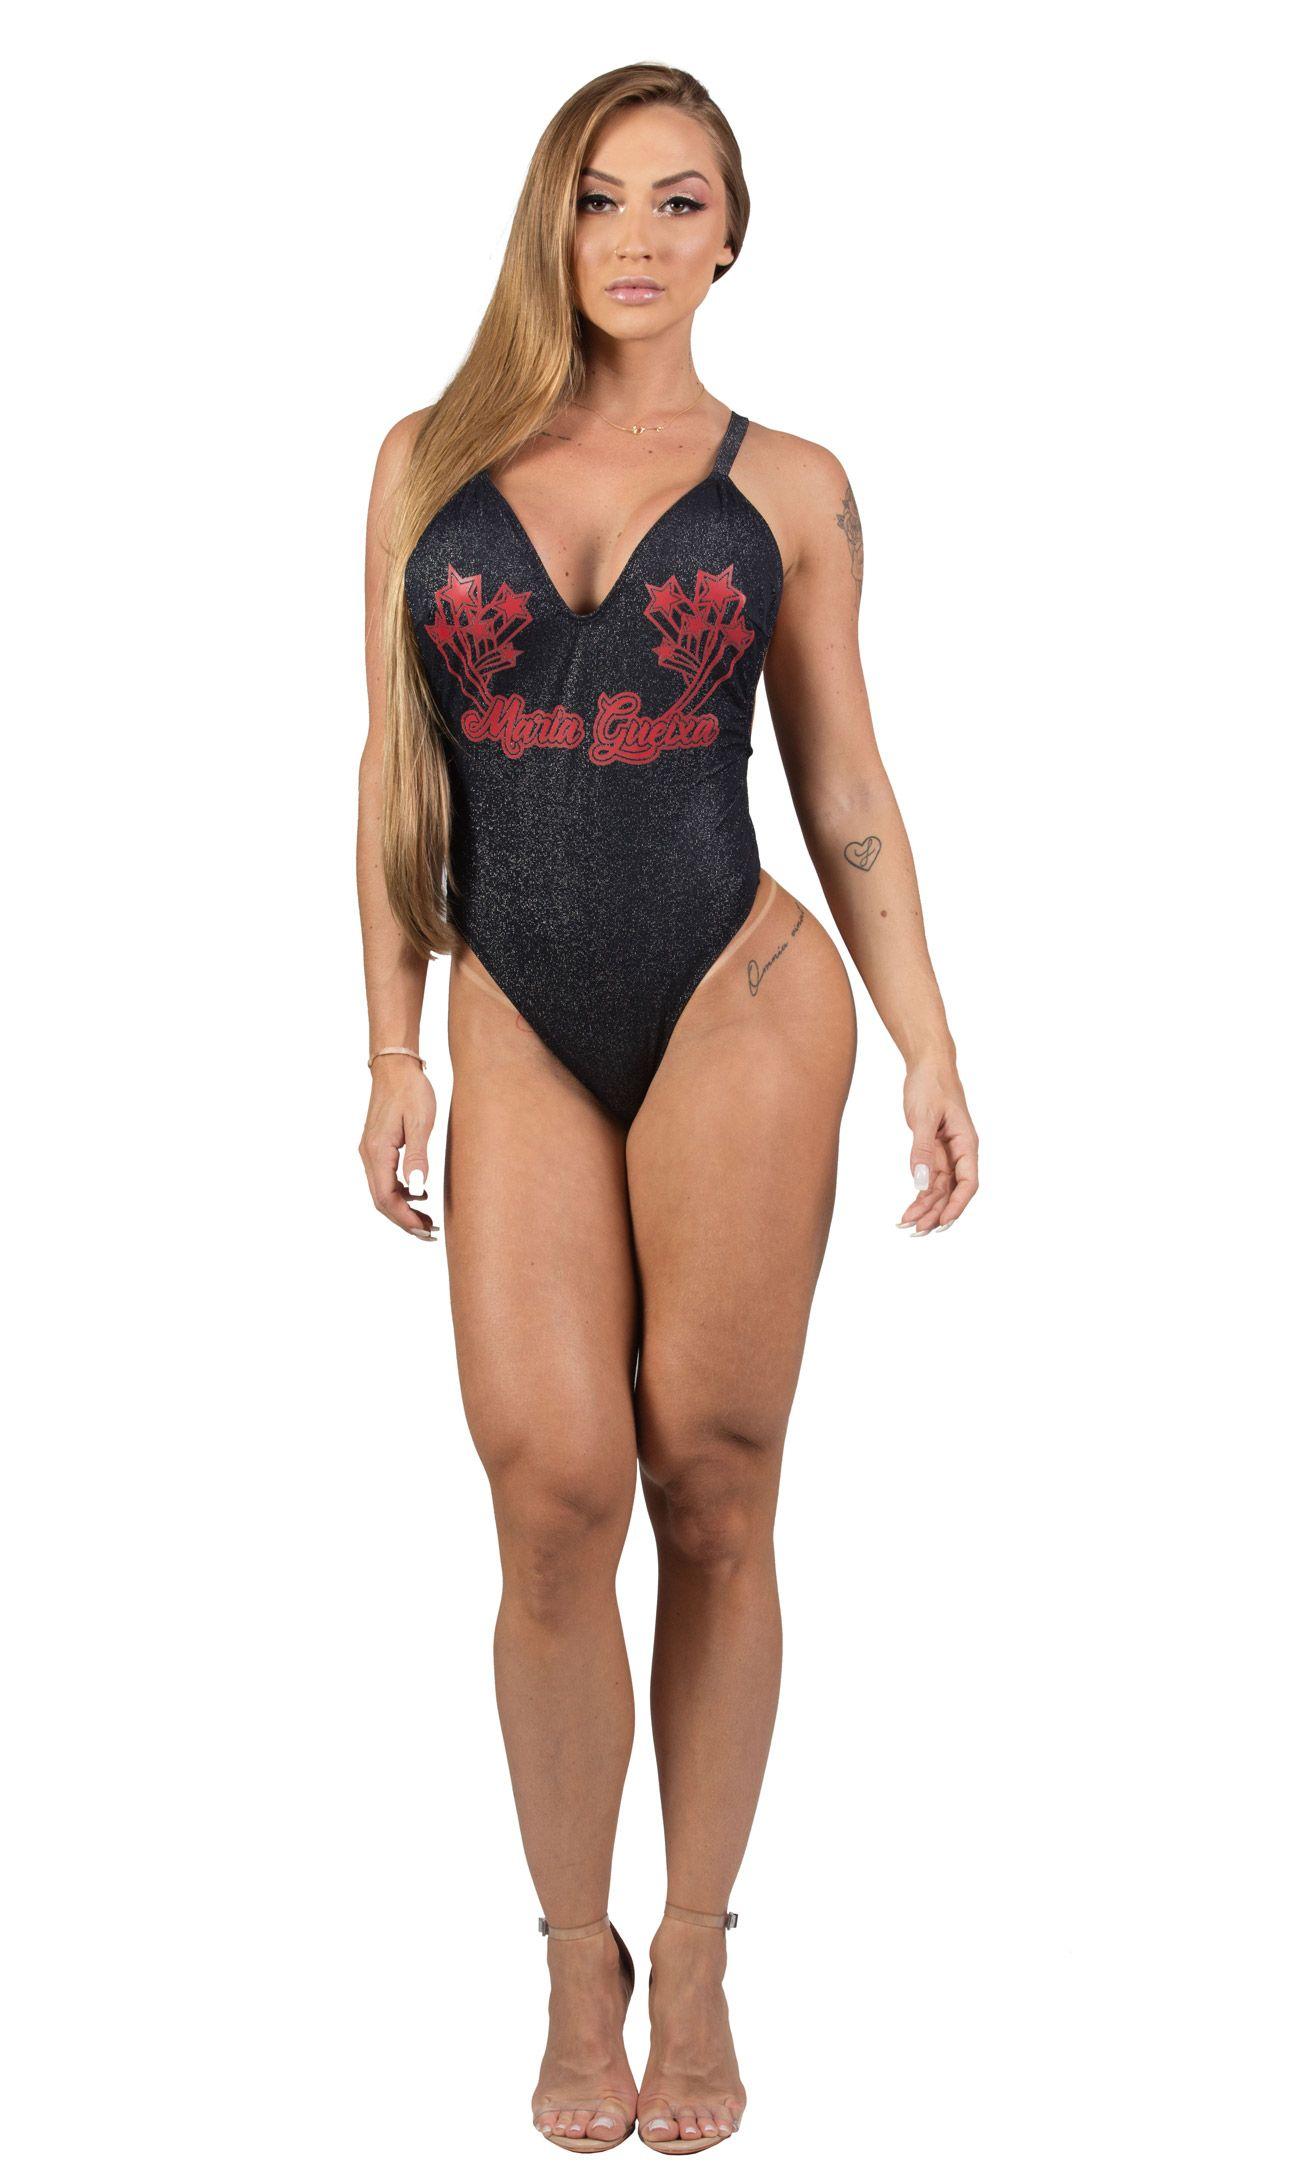 Maria Gueixa Lurex One-Piece Swimsuit Black